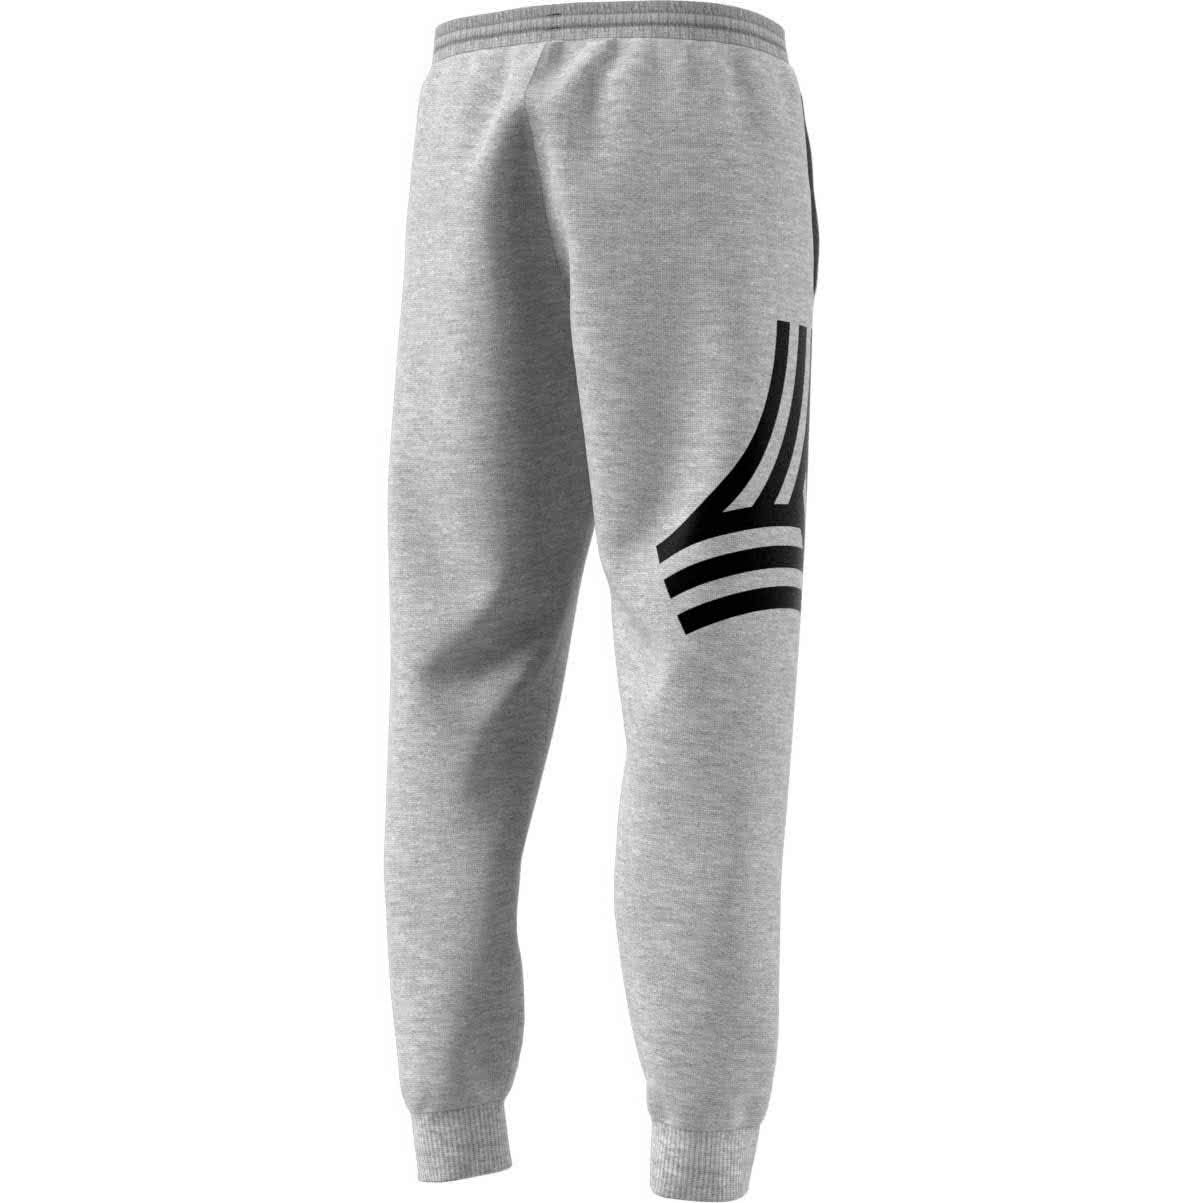 Hosen Jogginghose Performance Graphic Adidas Herren